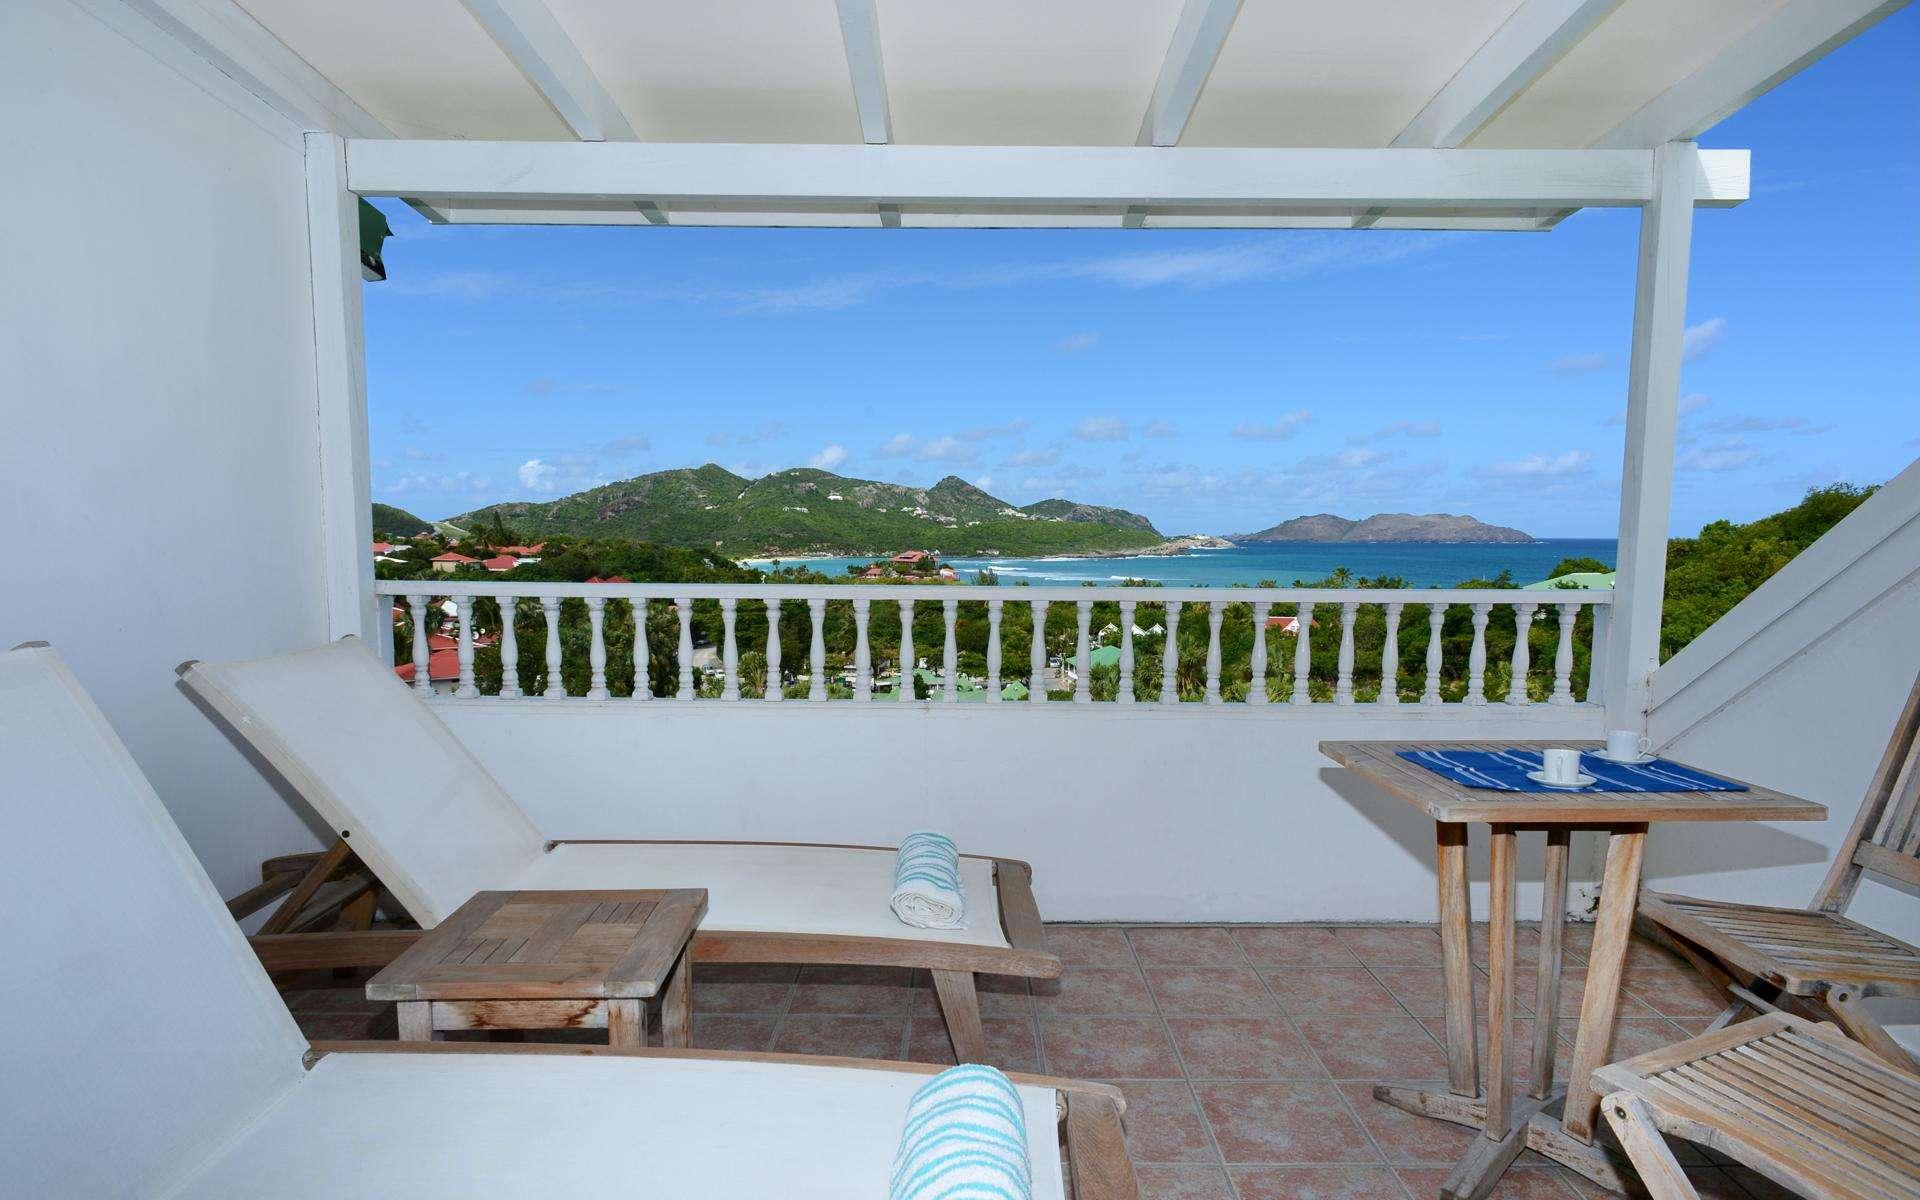 Luxury villa rentals caribbean - St barthelemy - Saint jean - les Jardins de Saint Jean - Image 1/12